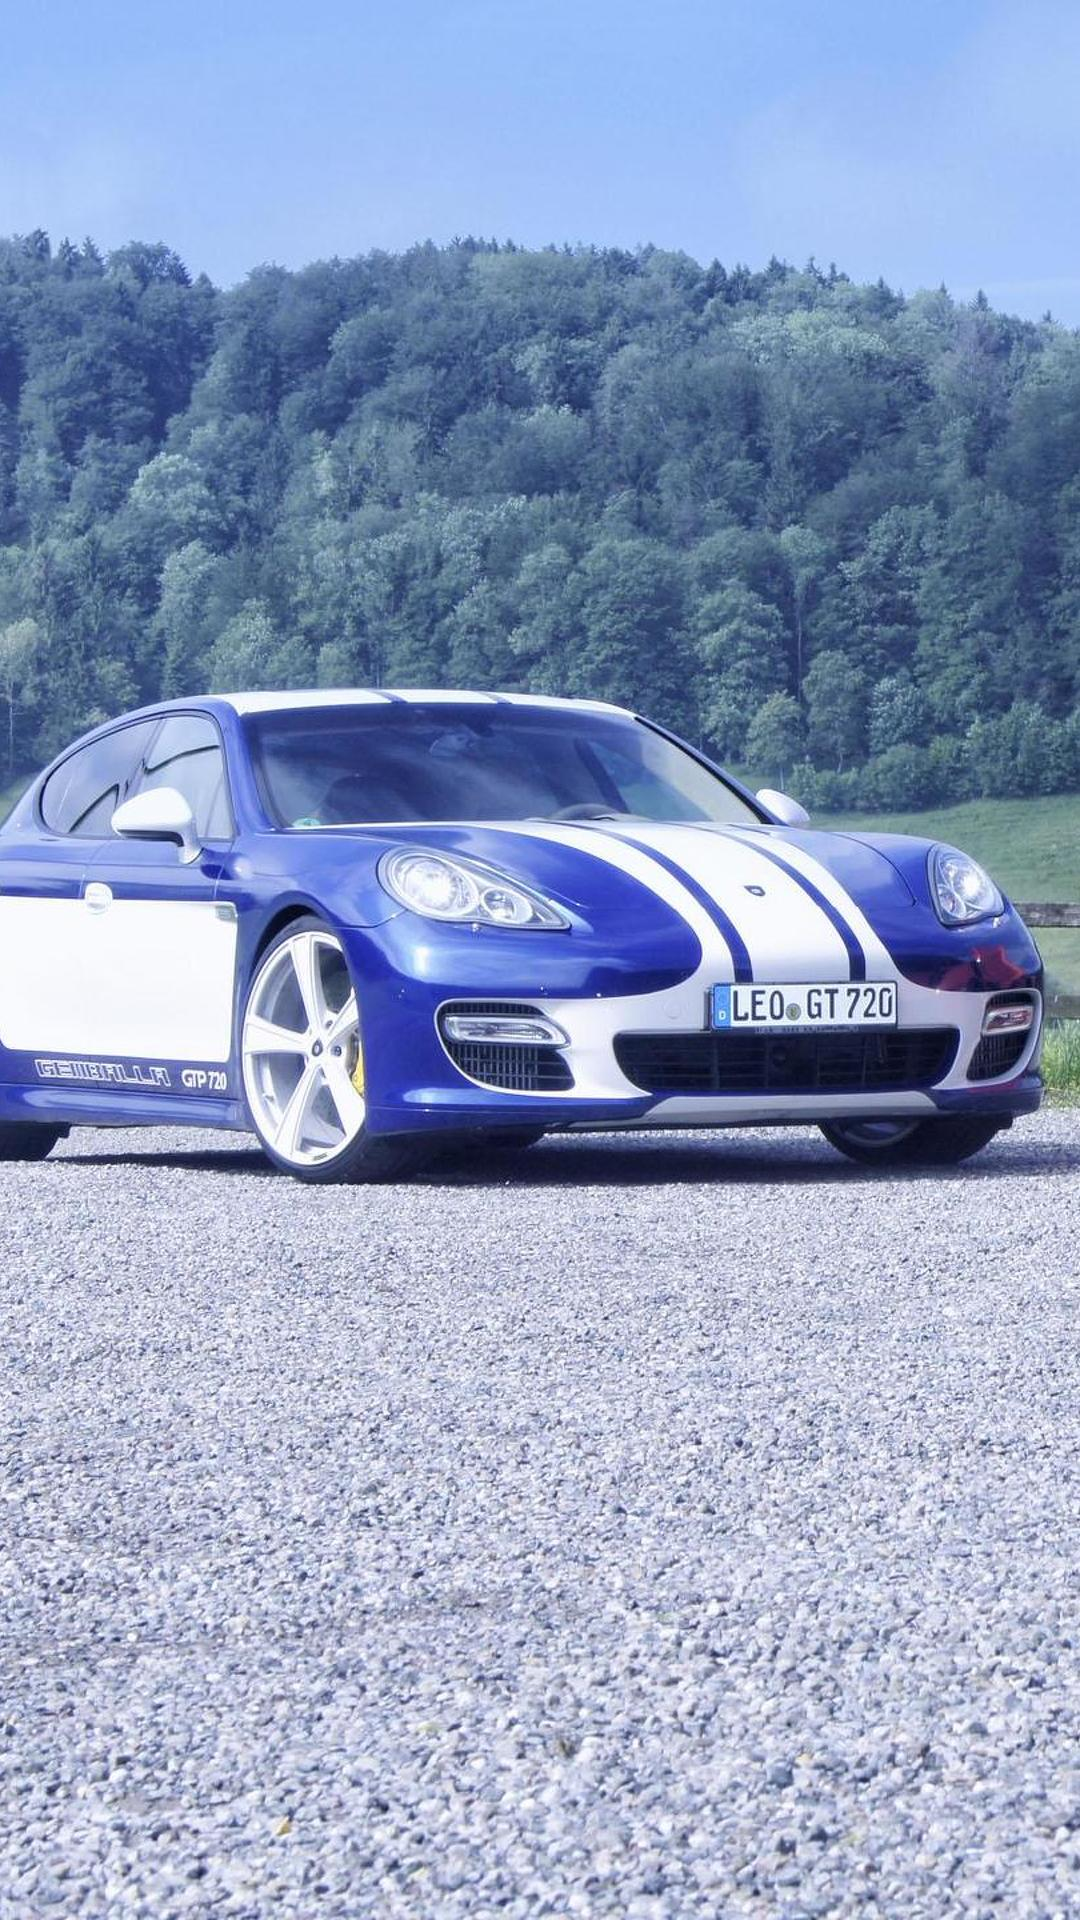 Новый тюнинг Porsche Panamera GTP 720 от Gemballa